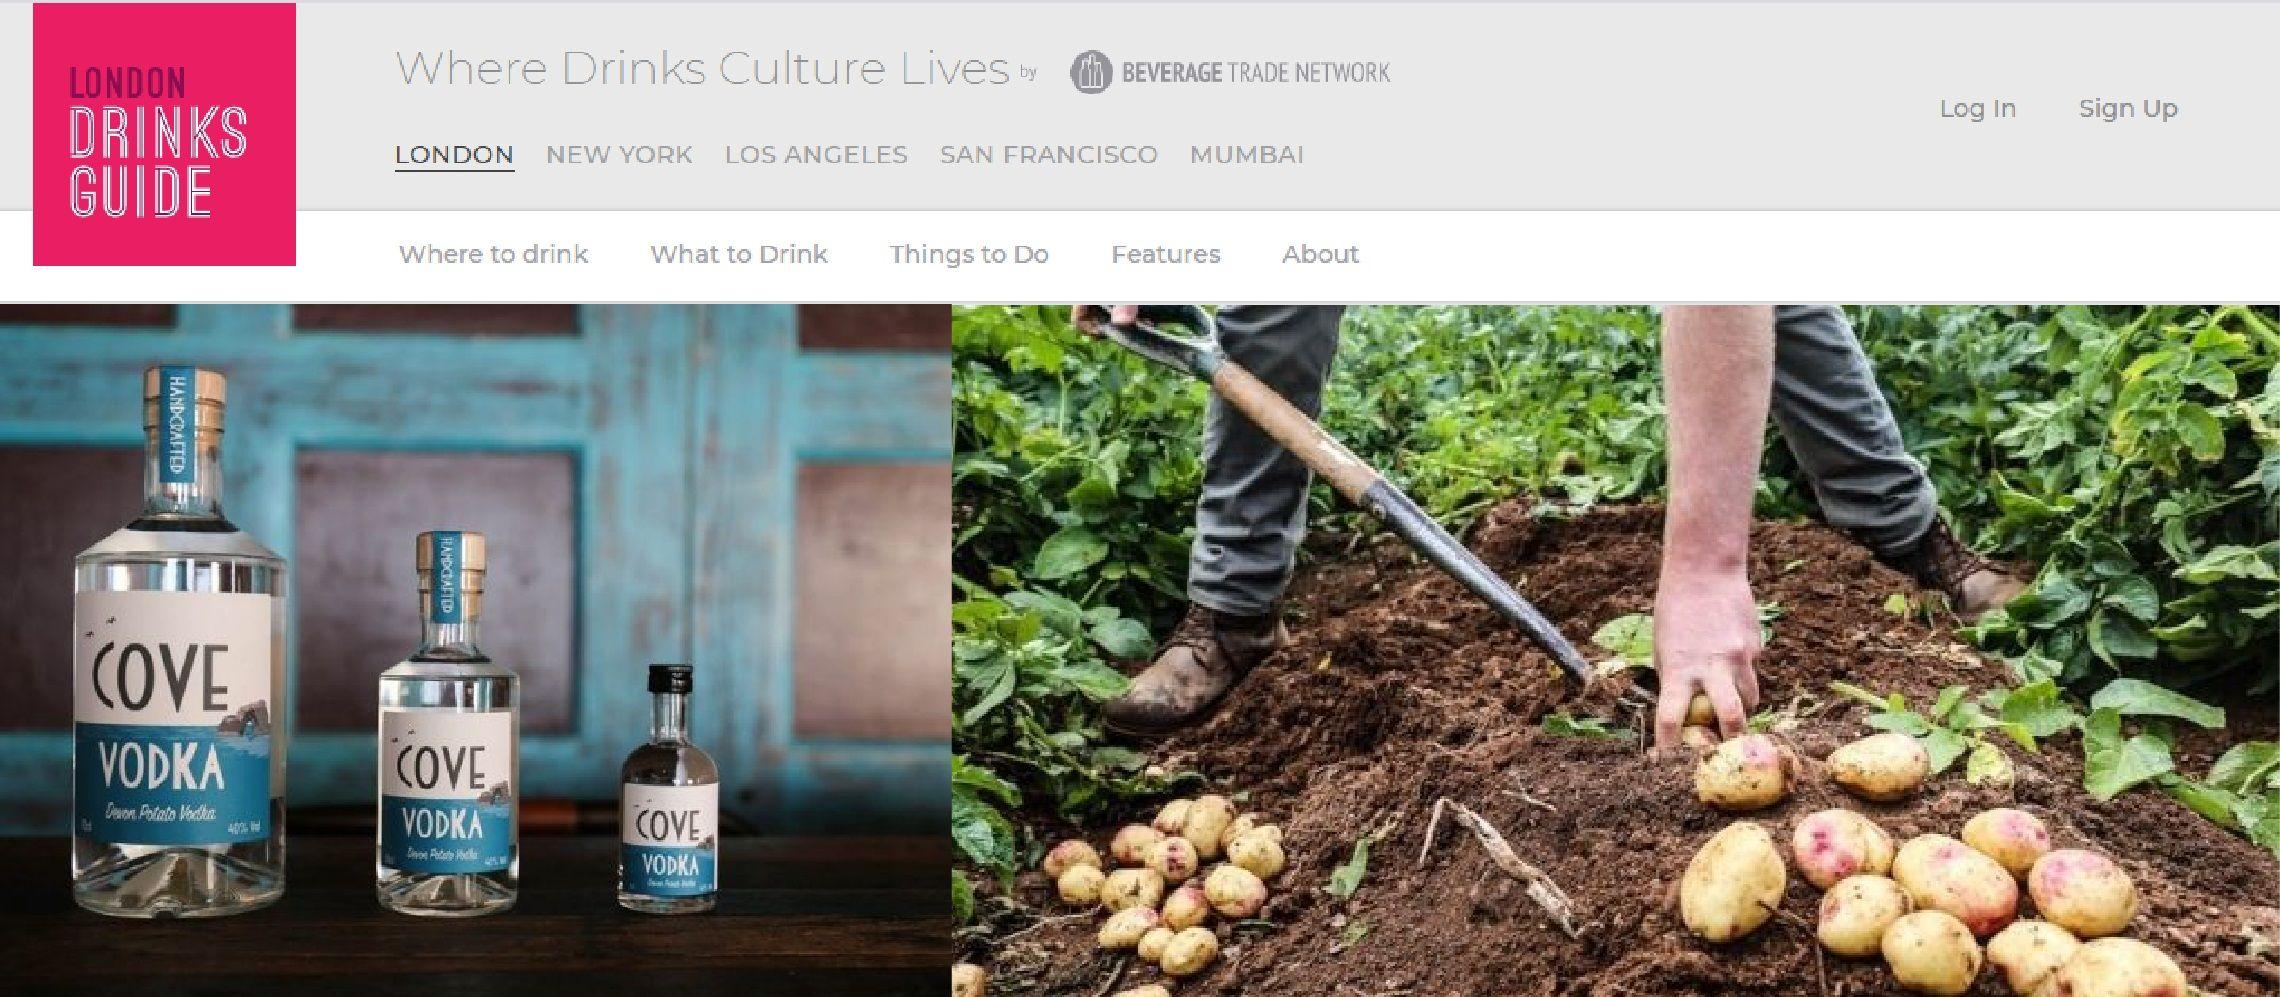 Photo for: Devon Cove Produce - Creating Exceptional Vodka